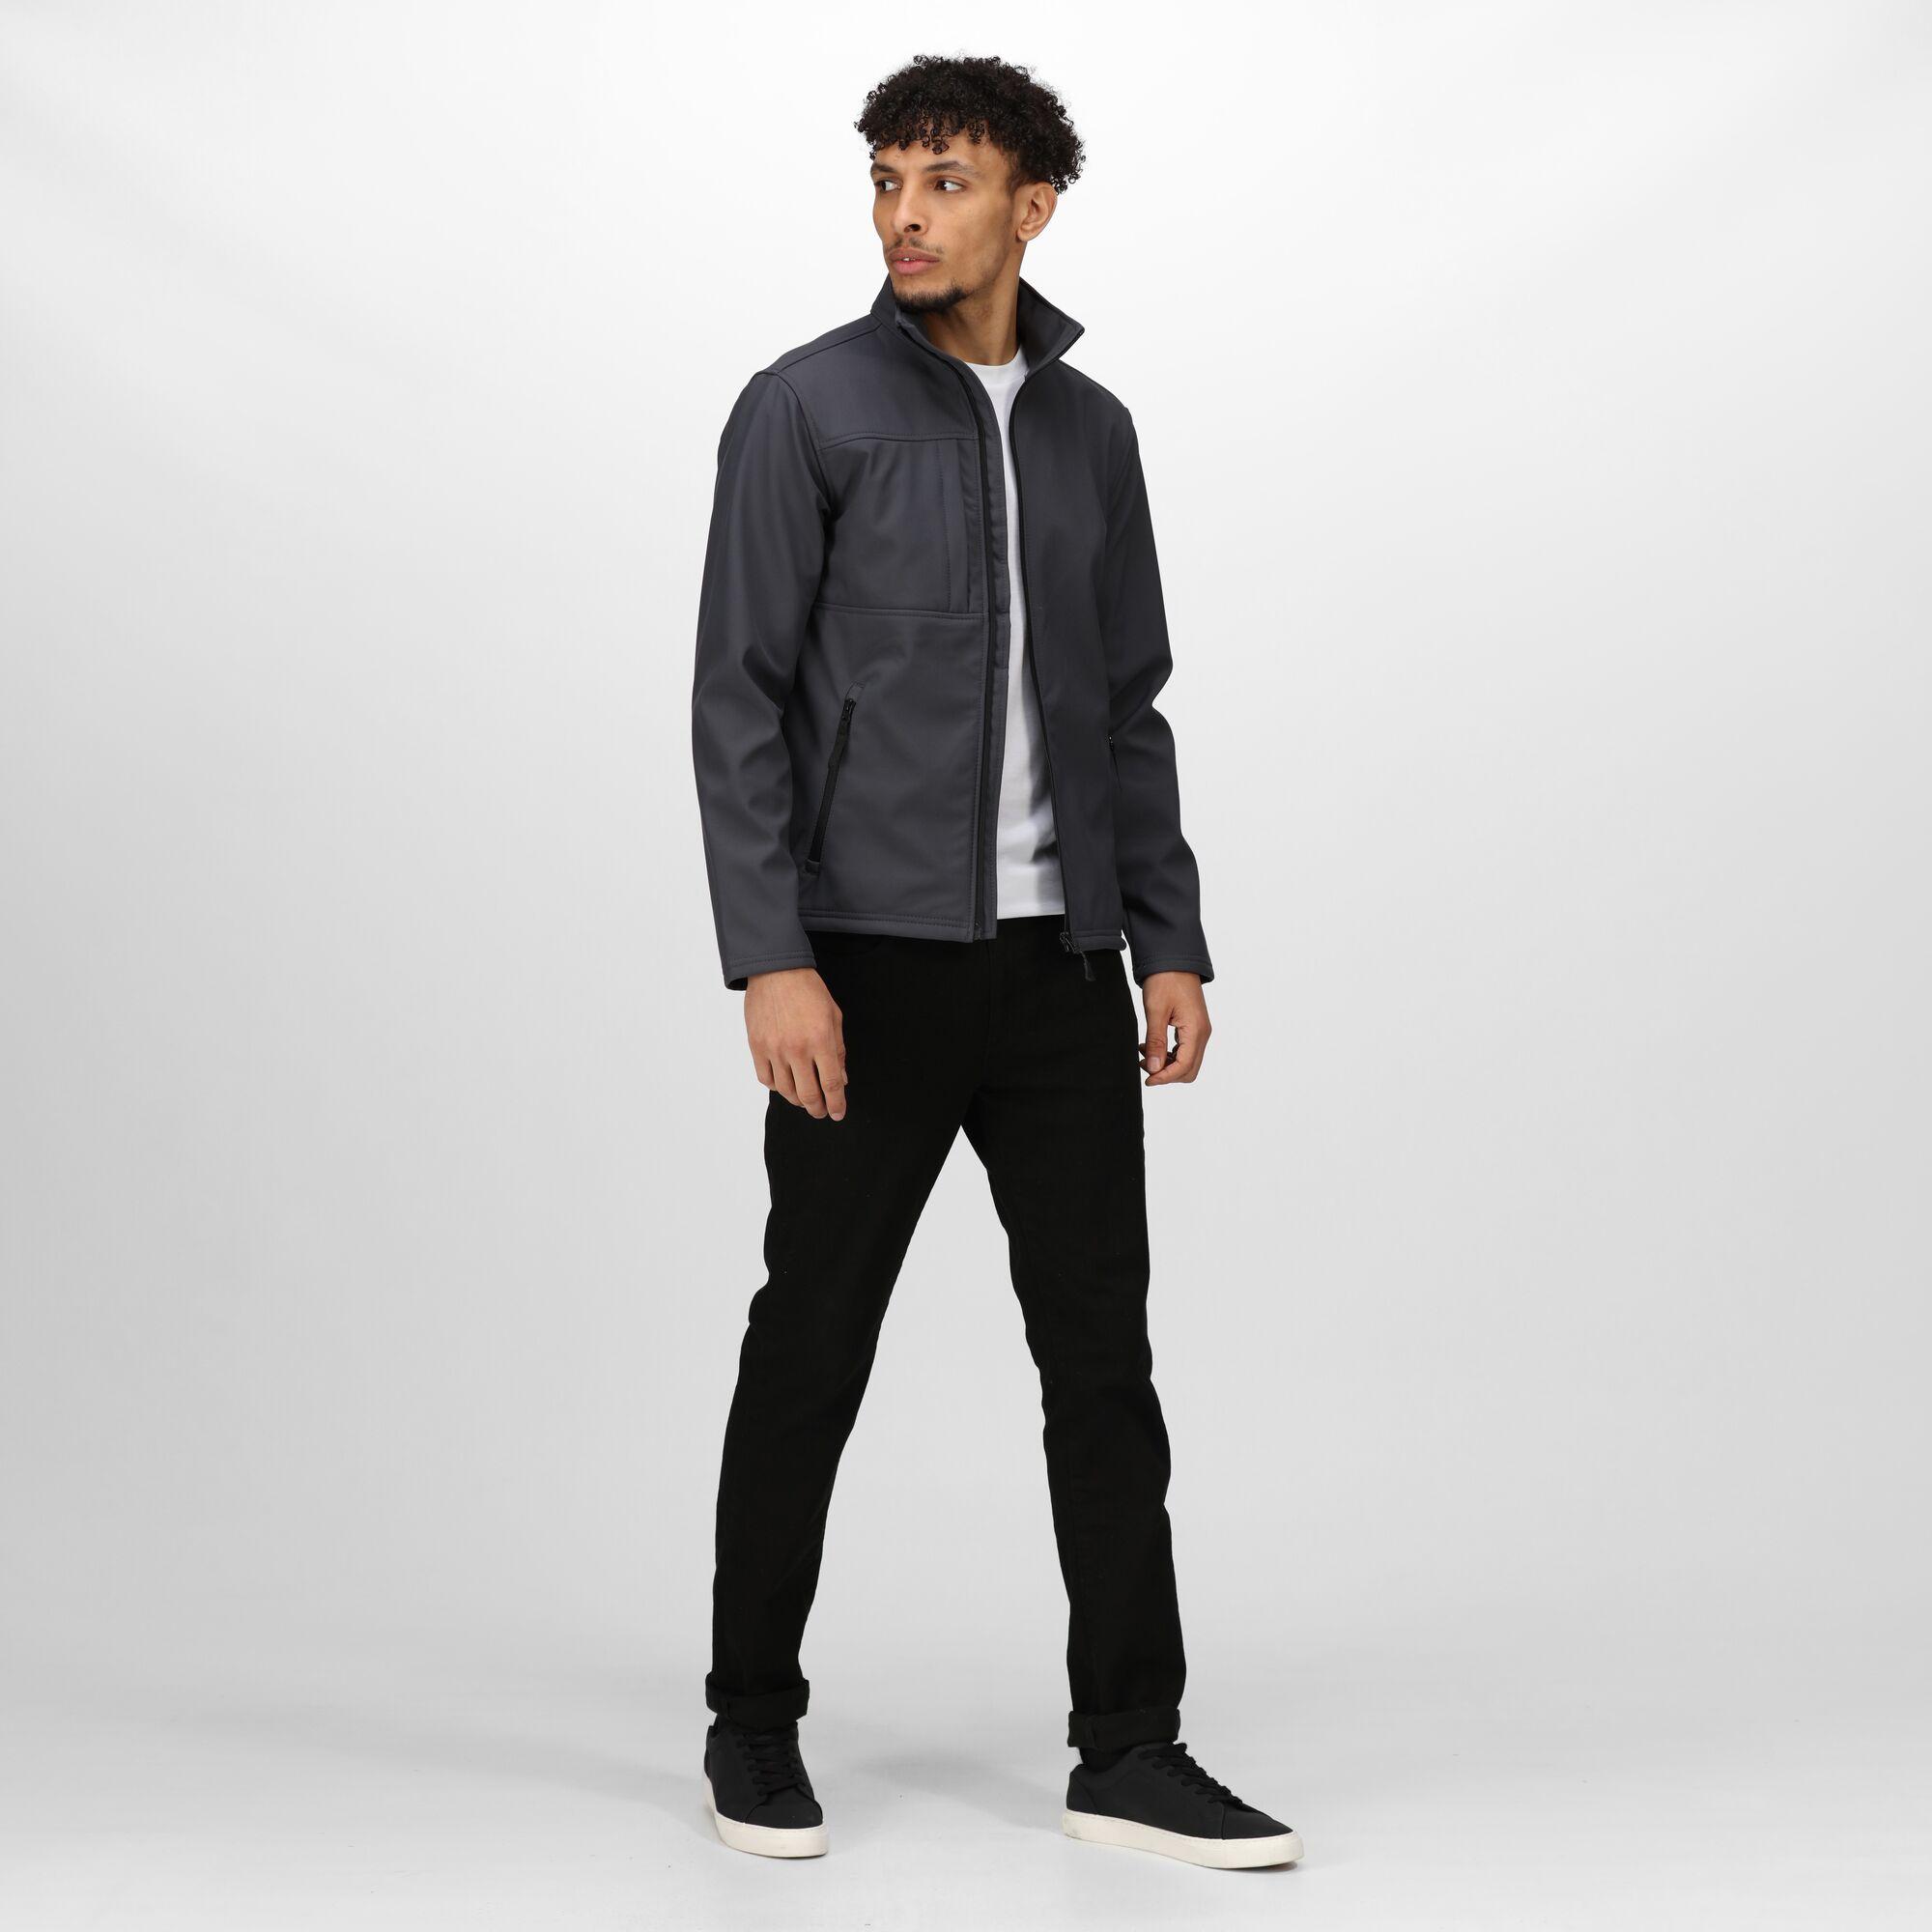 Regatta Professional Mens Octagon II 3 Layer Waterproof Warm Softshell Jacket